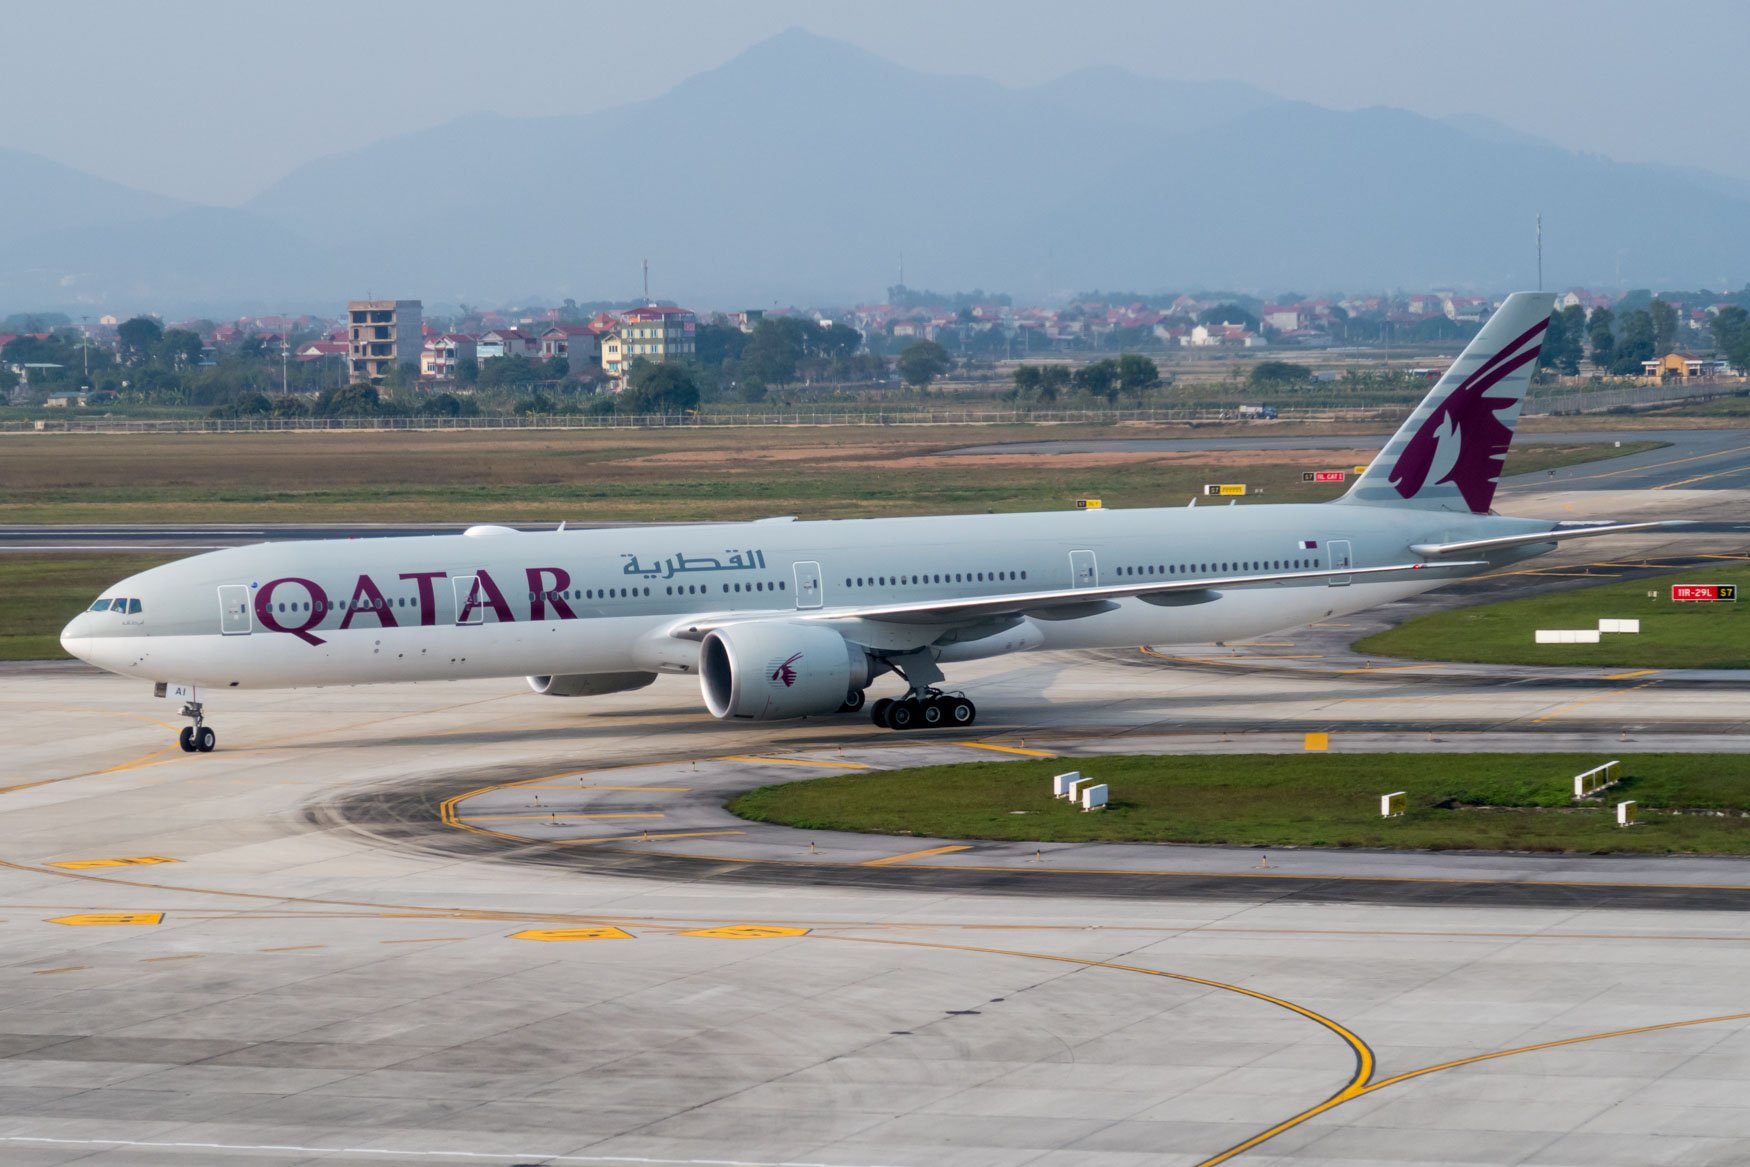 Qatar Airways Boeing 777-300ER Arriving at Hanoi from Bangkok